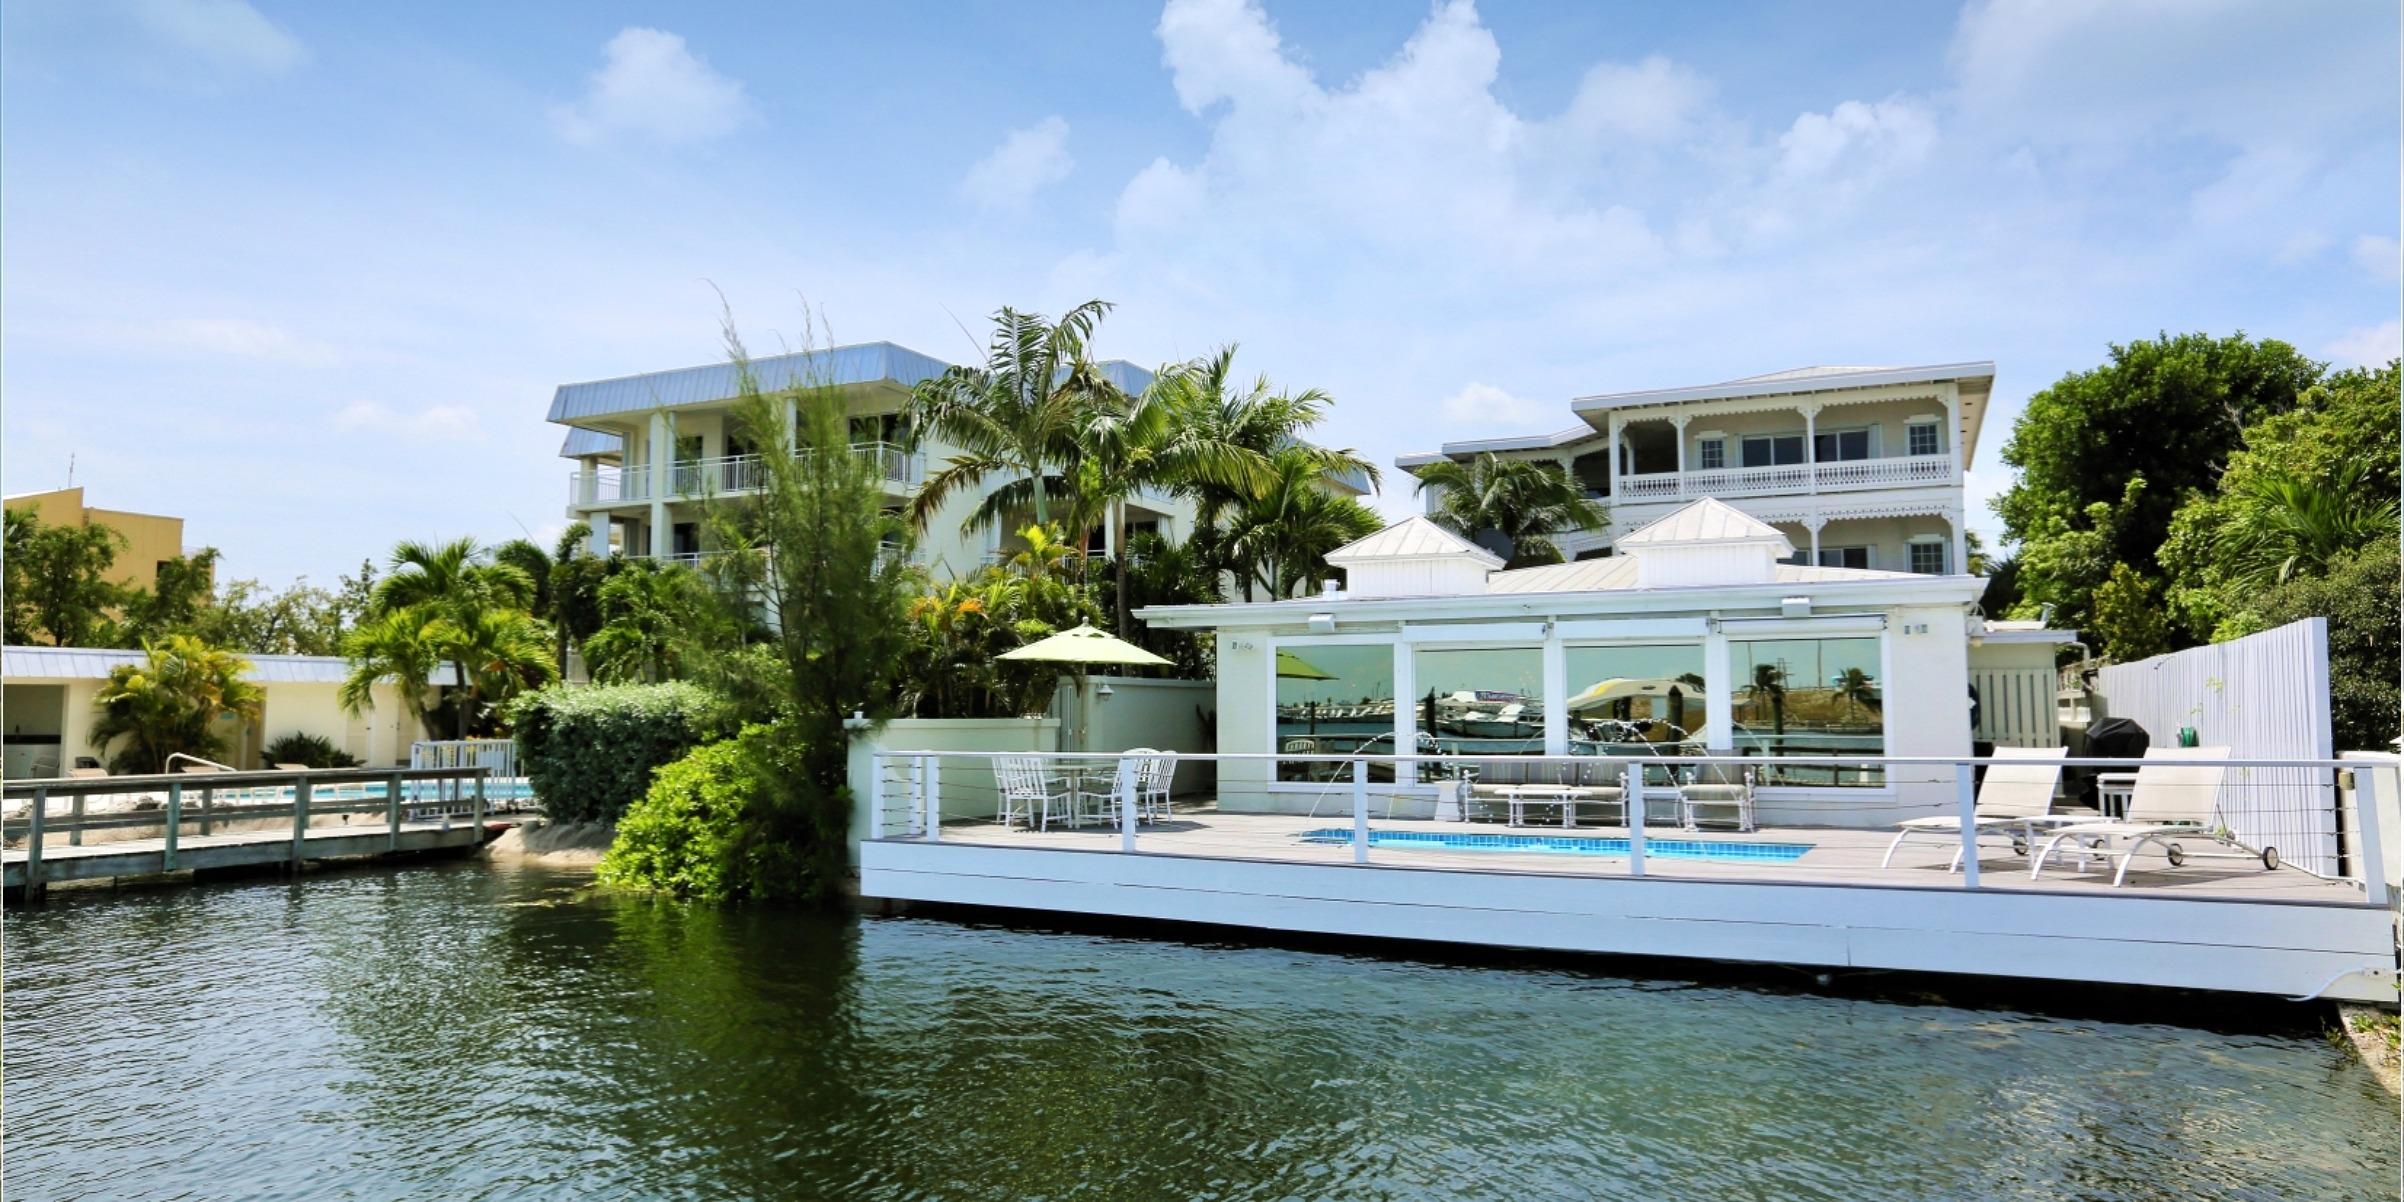 Key West Real Estate for sale